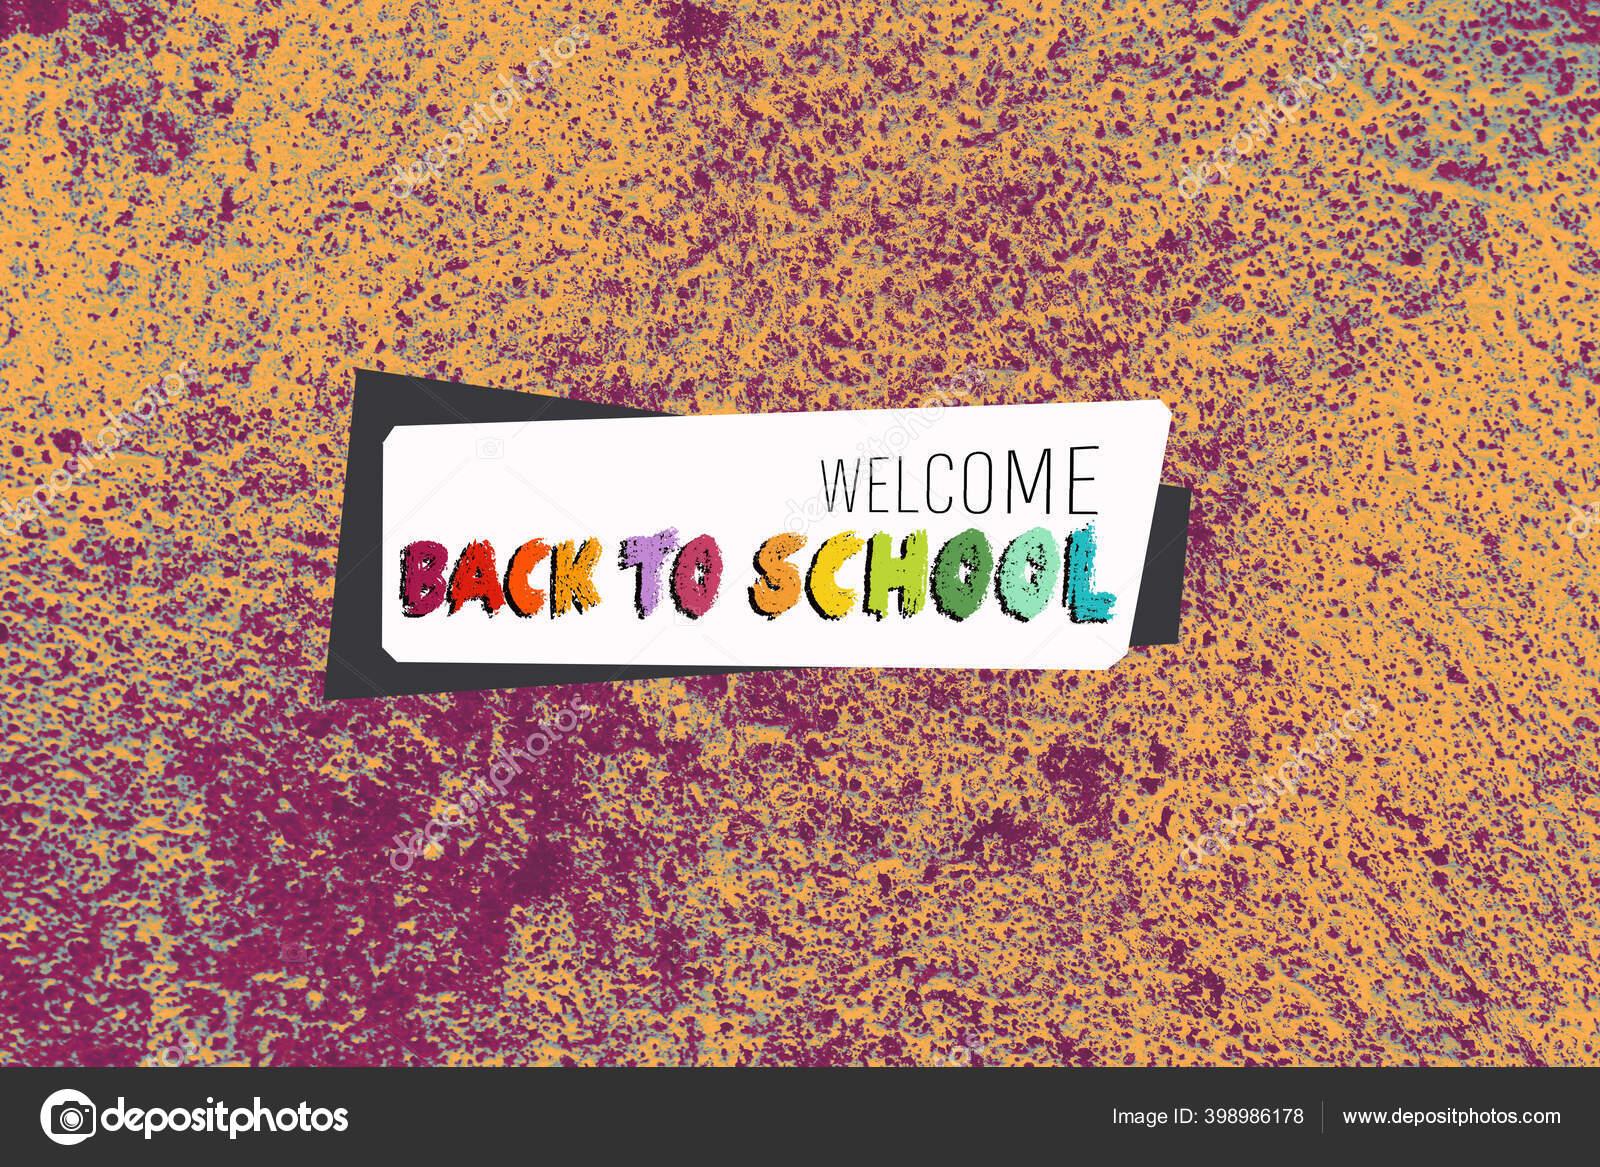 Kembali Templat Desain Sekolah Untuk Undangan Poster Promosi Spanduk Stok Foto C Turgayada Hotmail Com 398986178